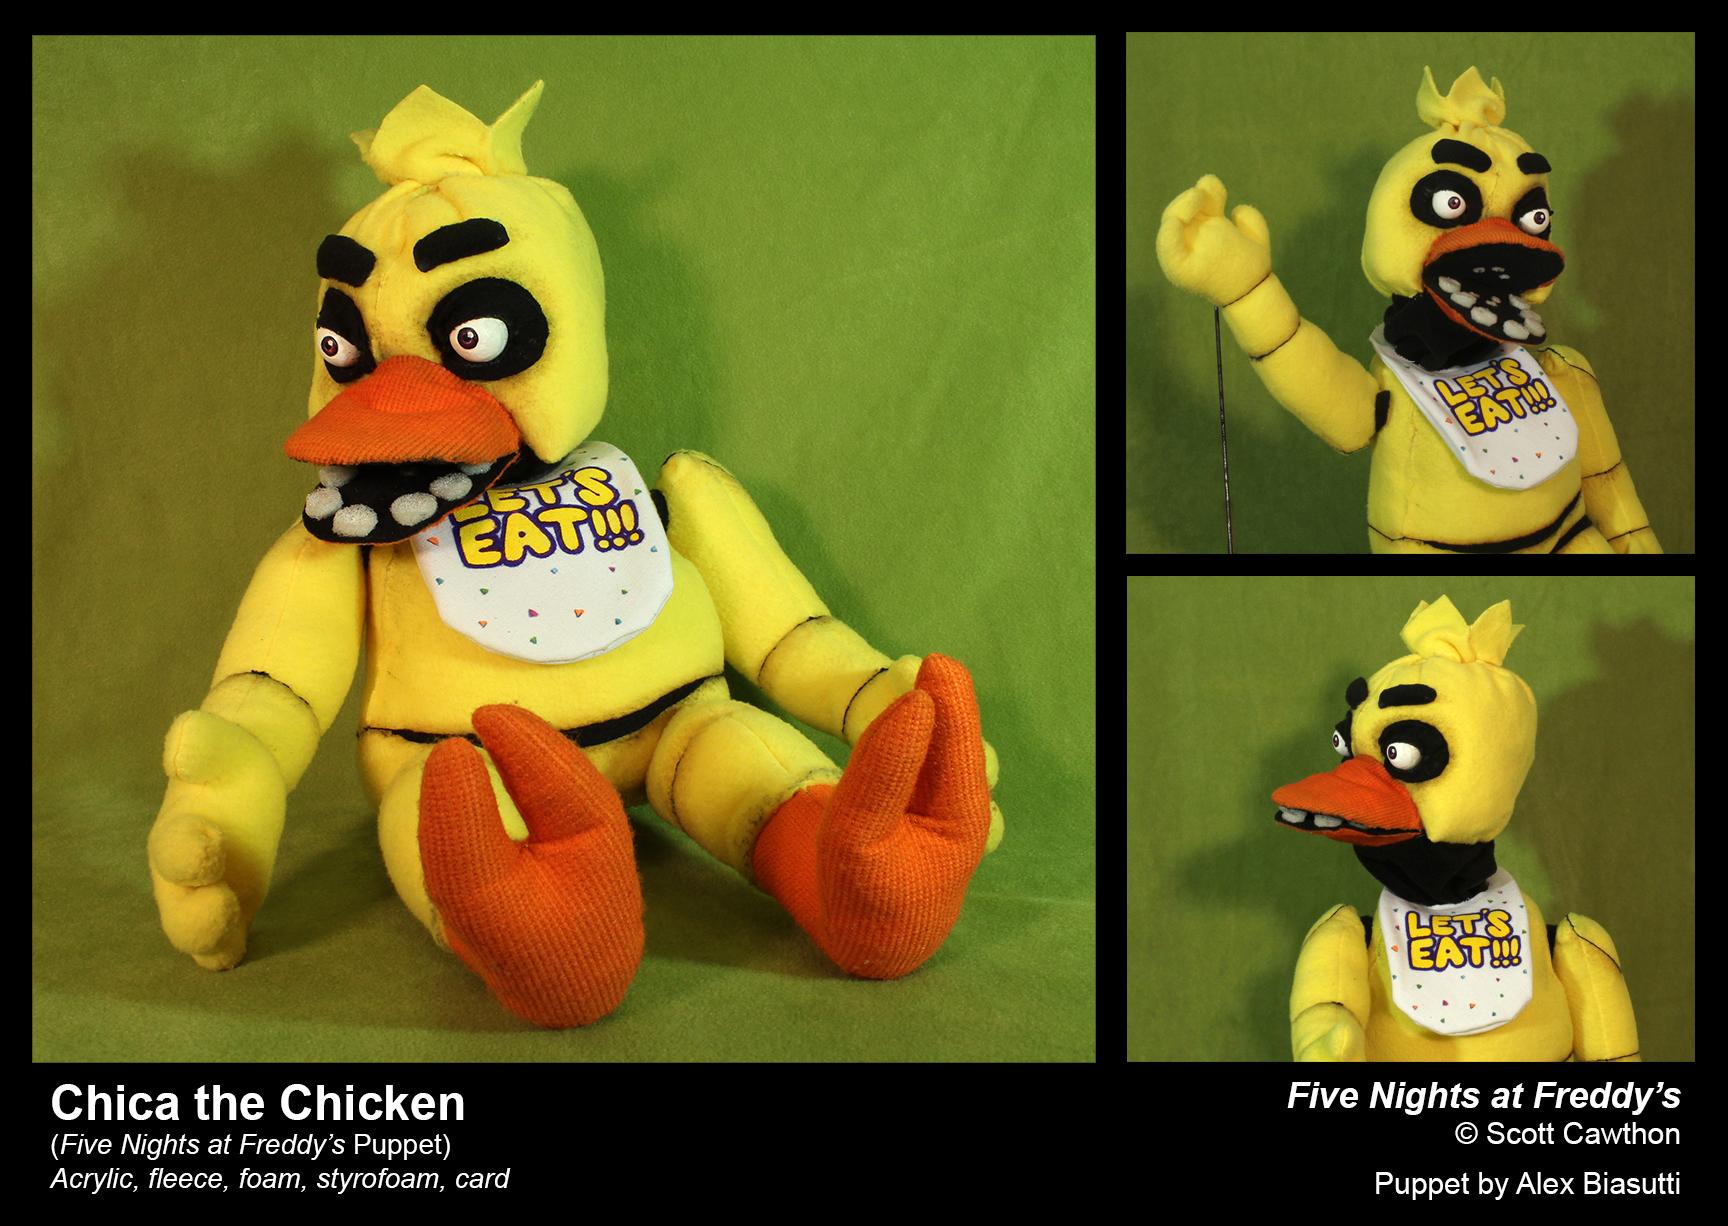 Chica the Chicken Puppet.jpg